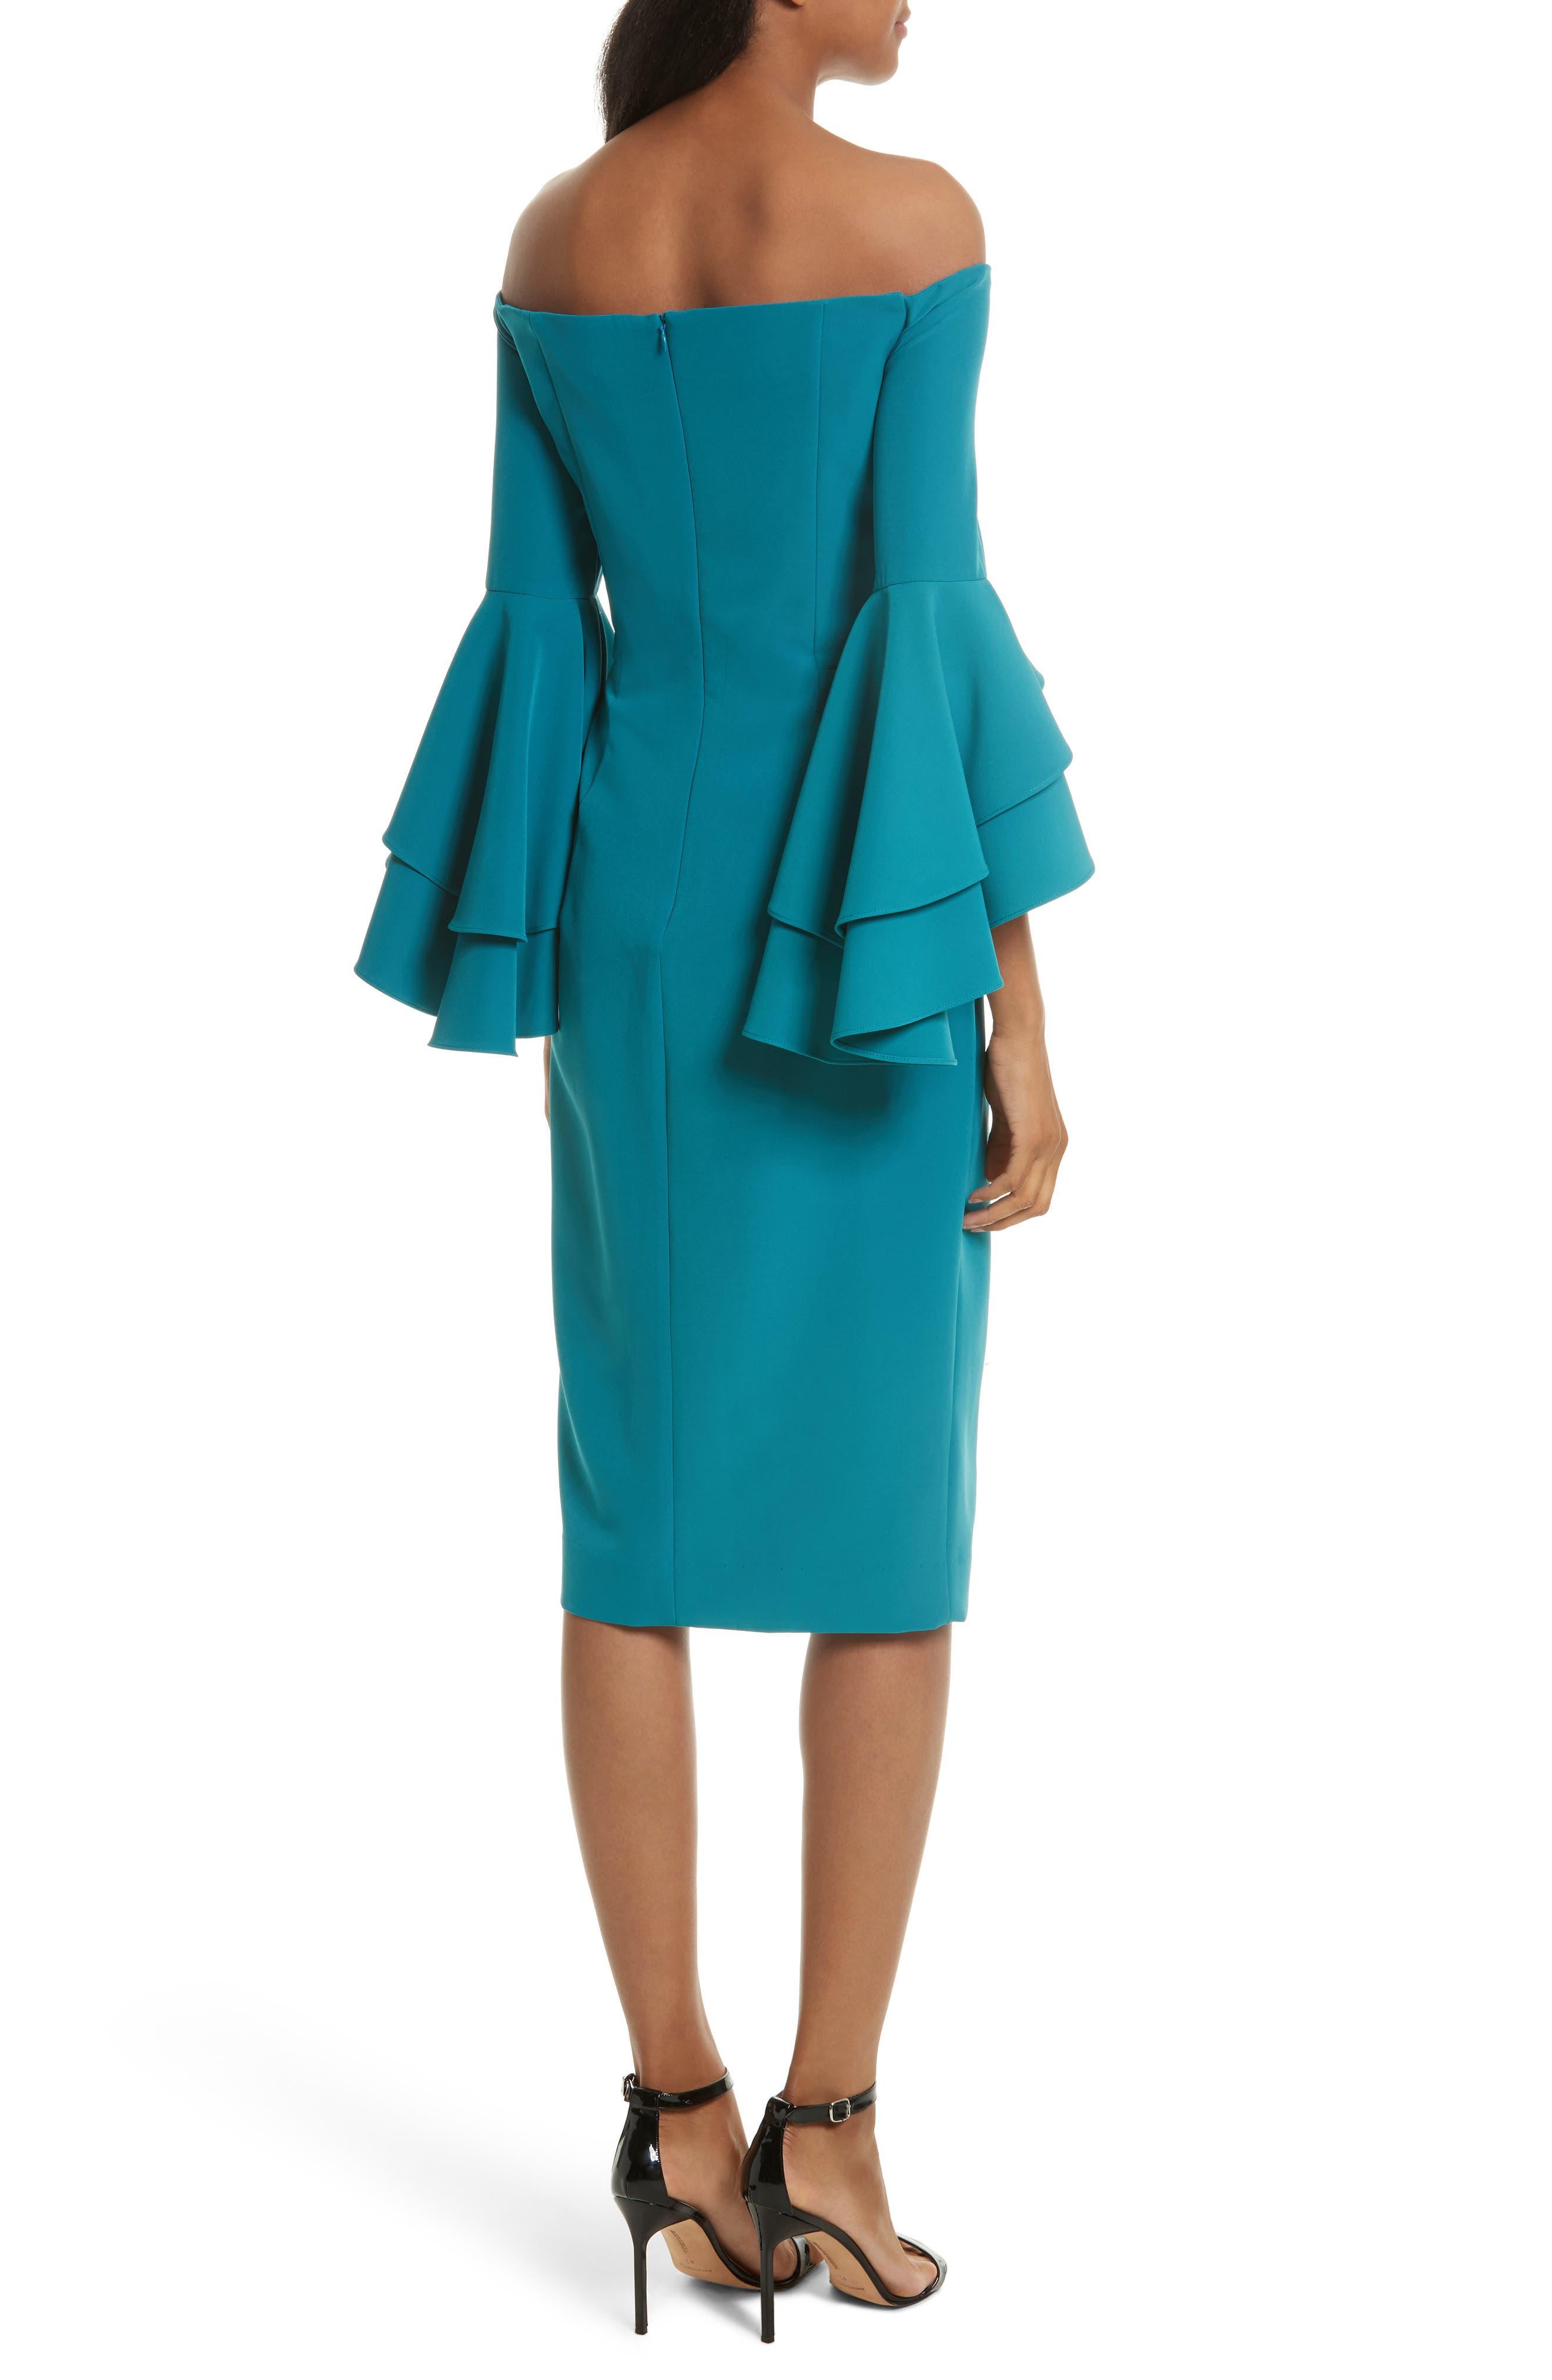 MILLY, Selena Off the Shoulder Midi Dress, Alternate thumbnail 2, color, 442